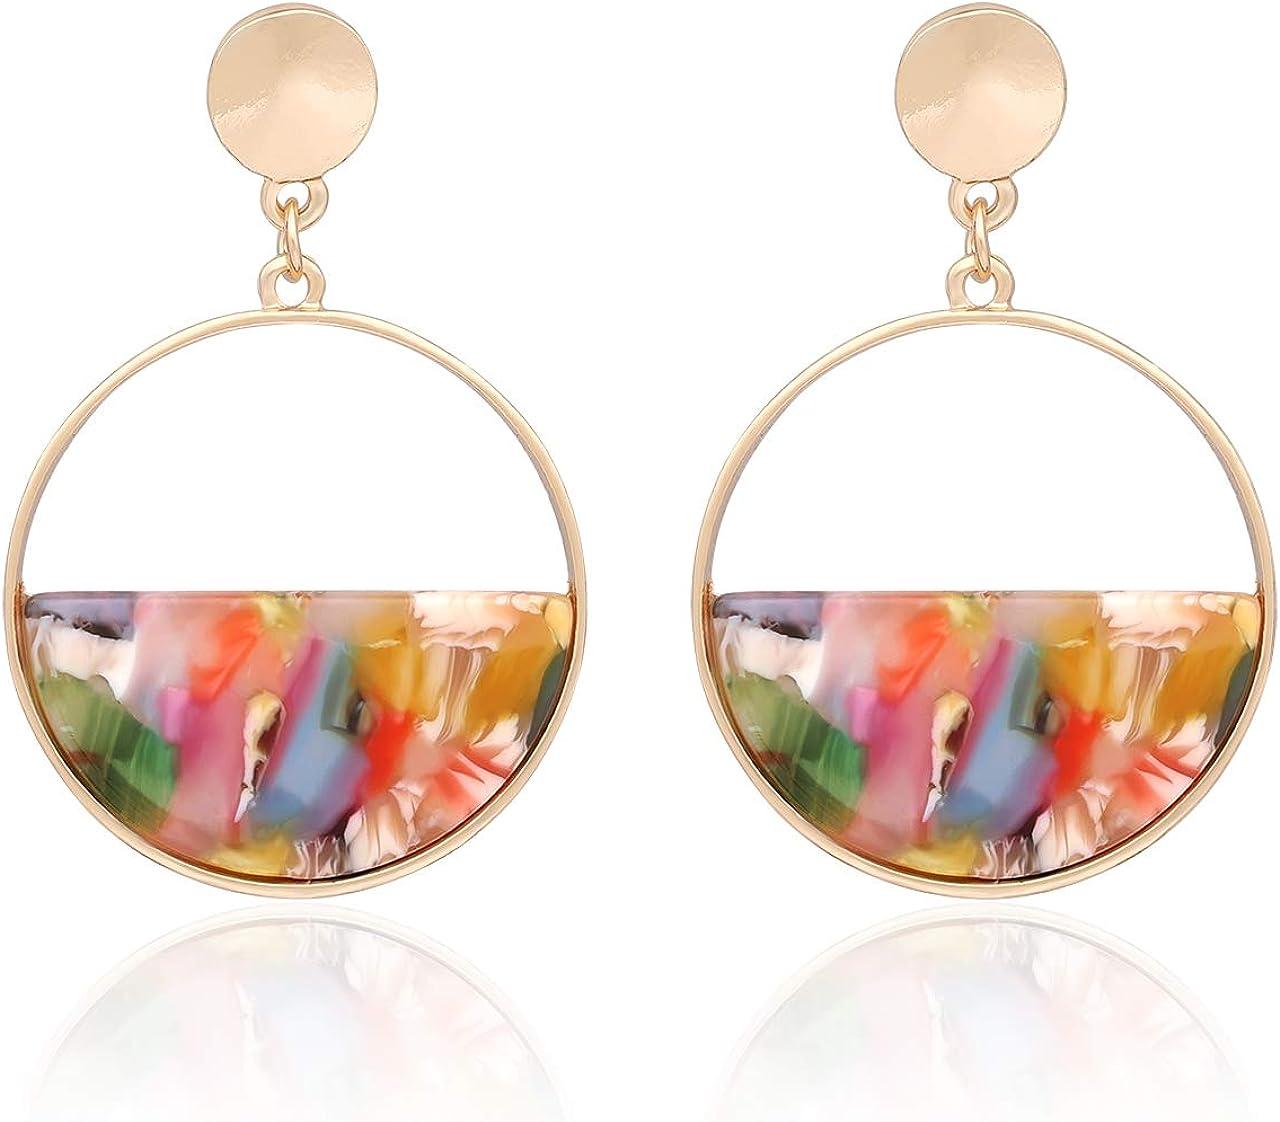 Acetate earrings tortoise shell earrings statement earrings gold earrings acrylic earrings dangle earrings for women birthday gifts